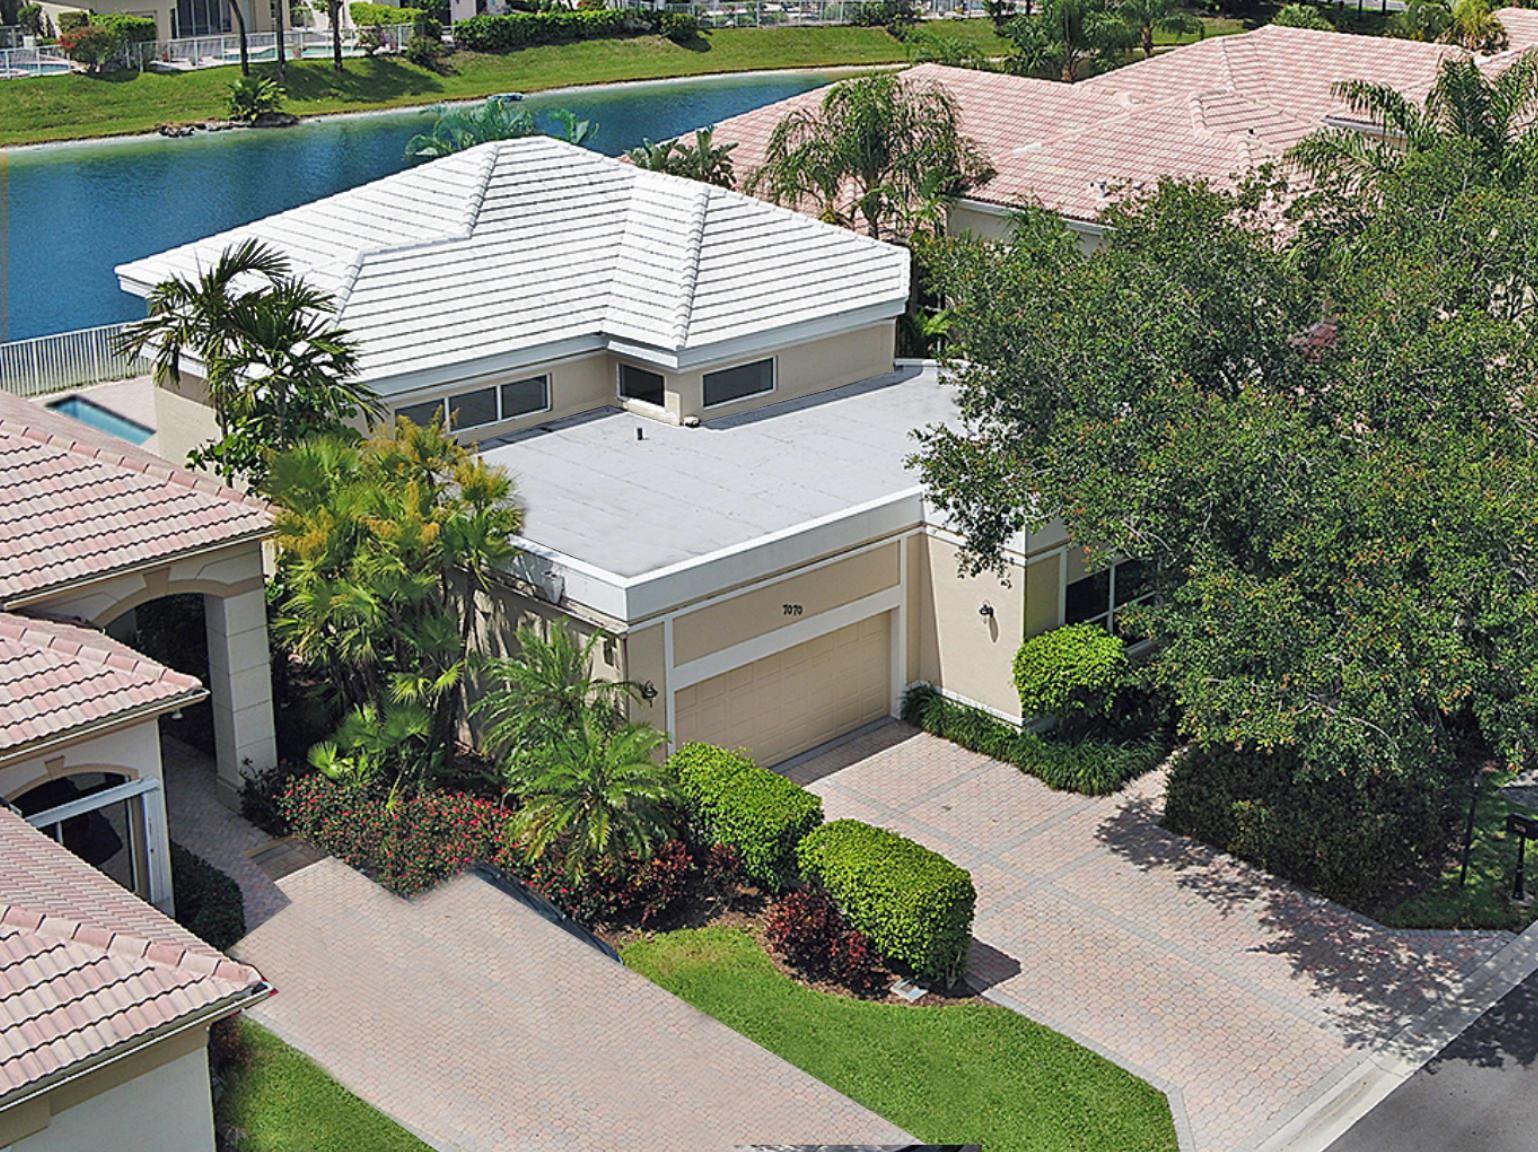 7070 Islegrove Place, Boca Raton, FL 33433 - #: RX-10620237